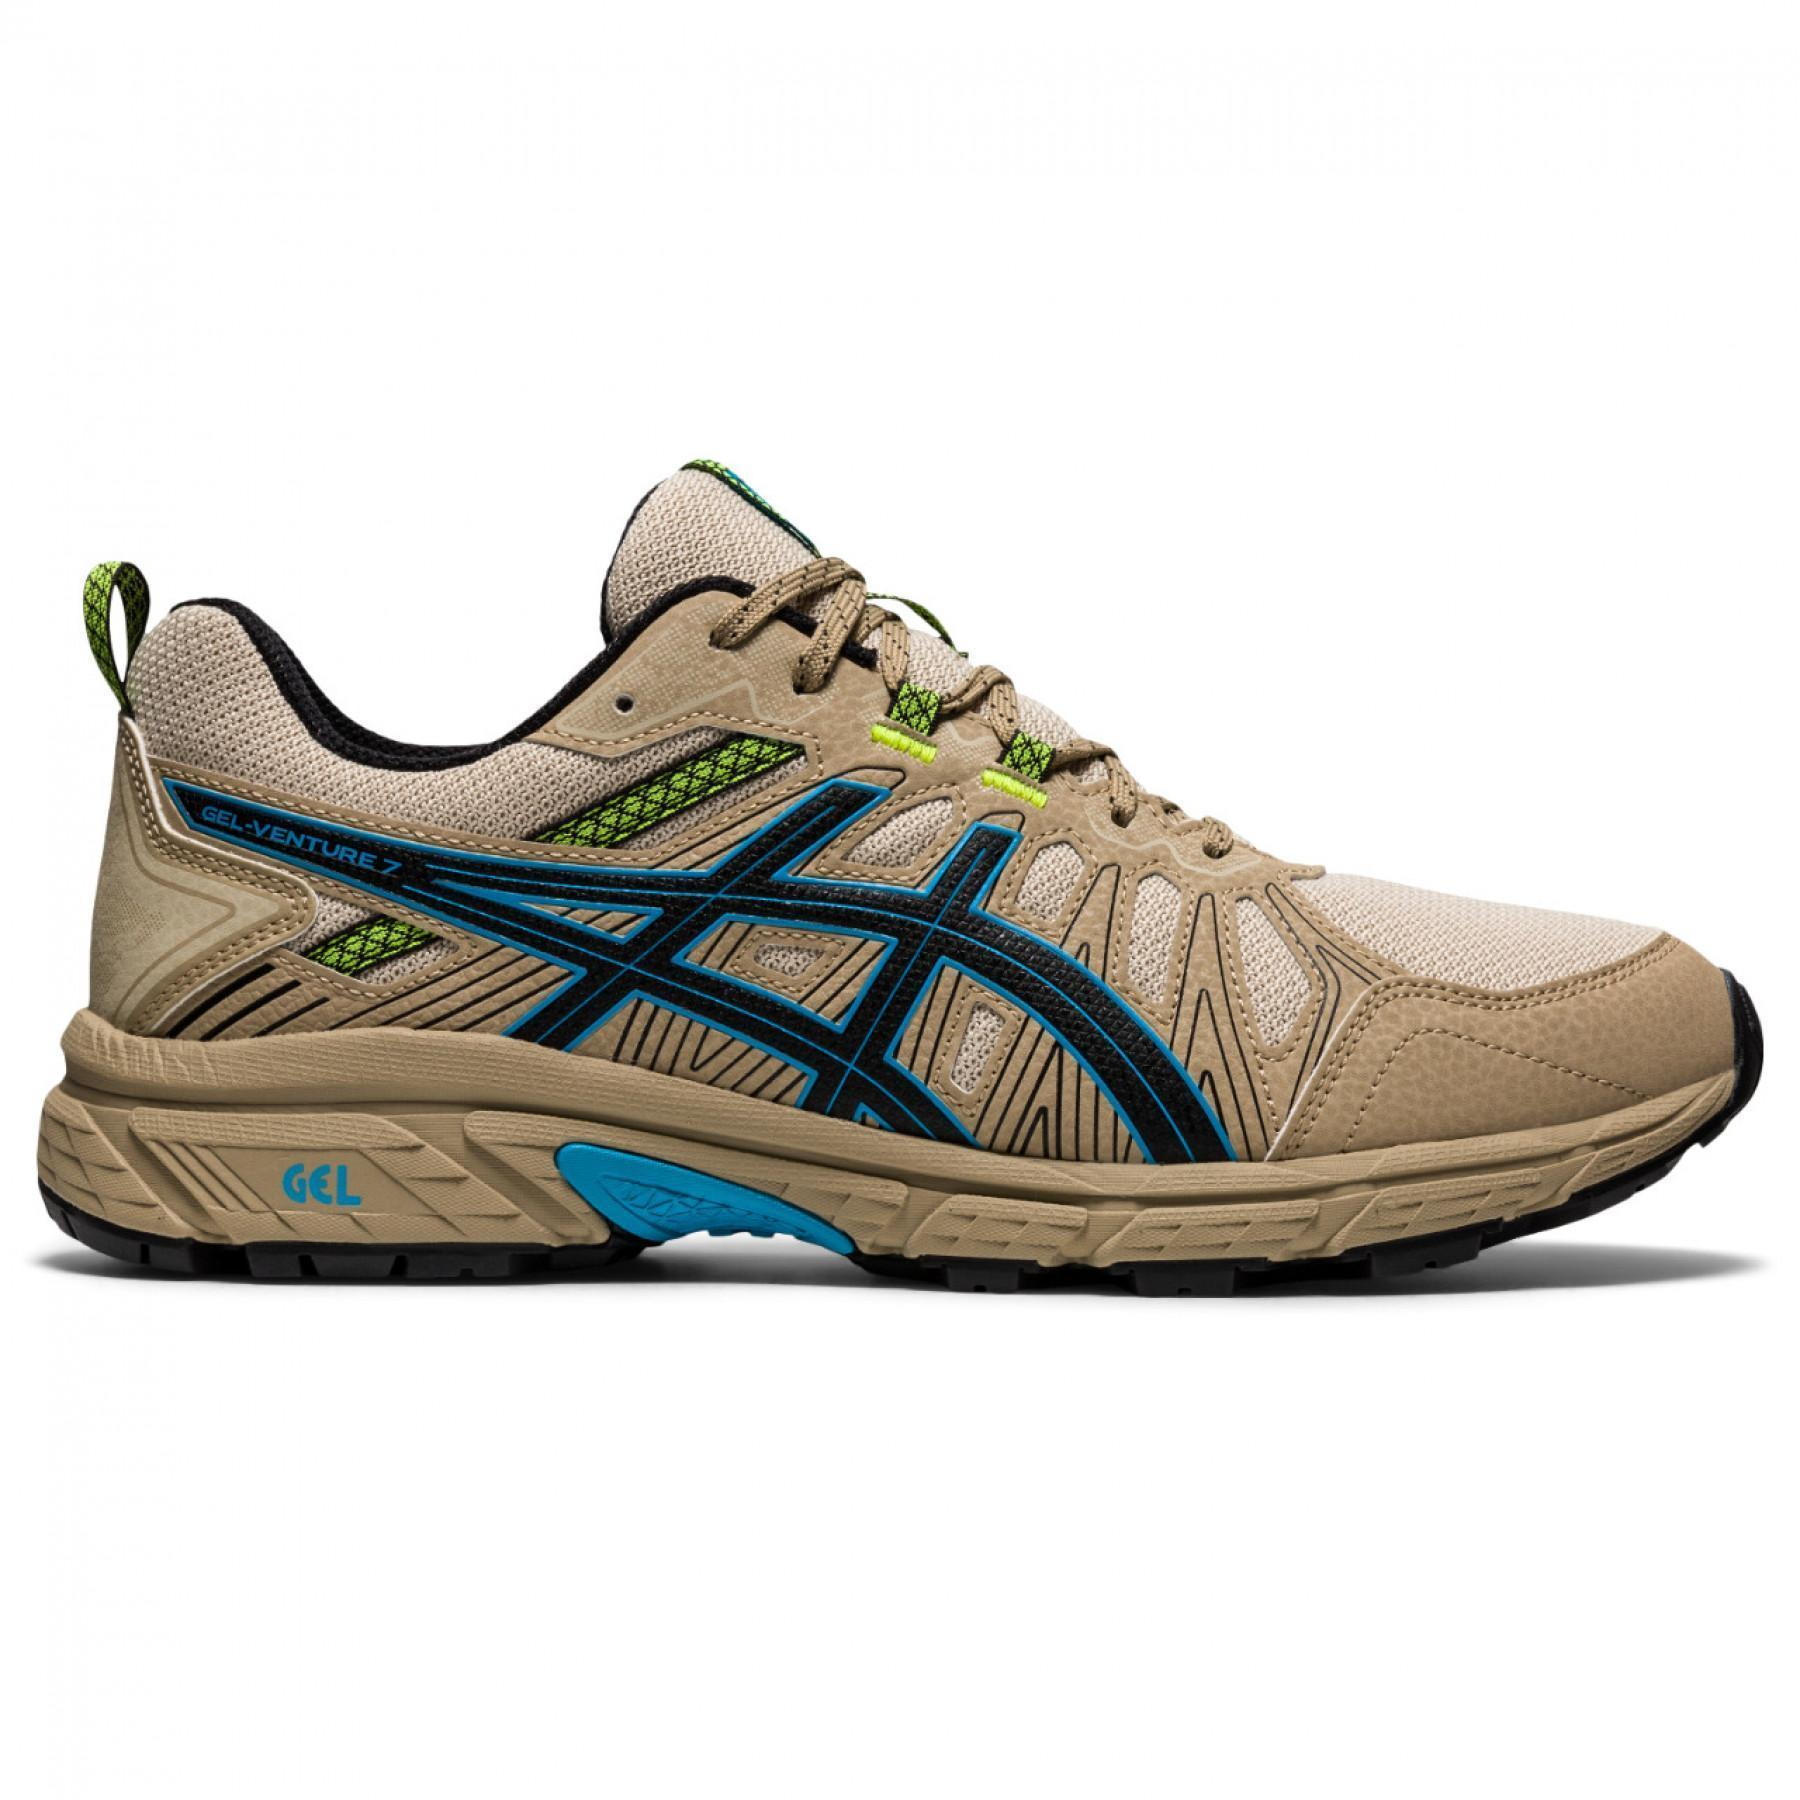 Asics Gel-Venture 7 Shoes